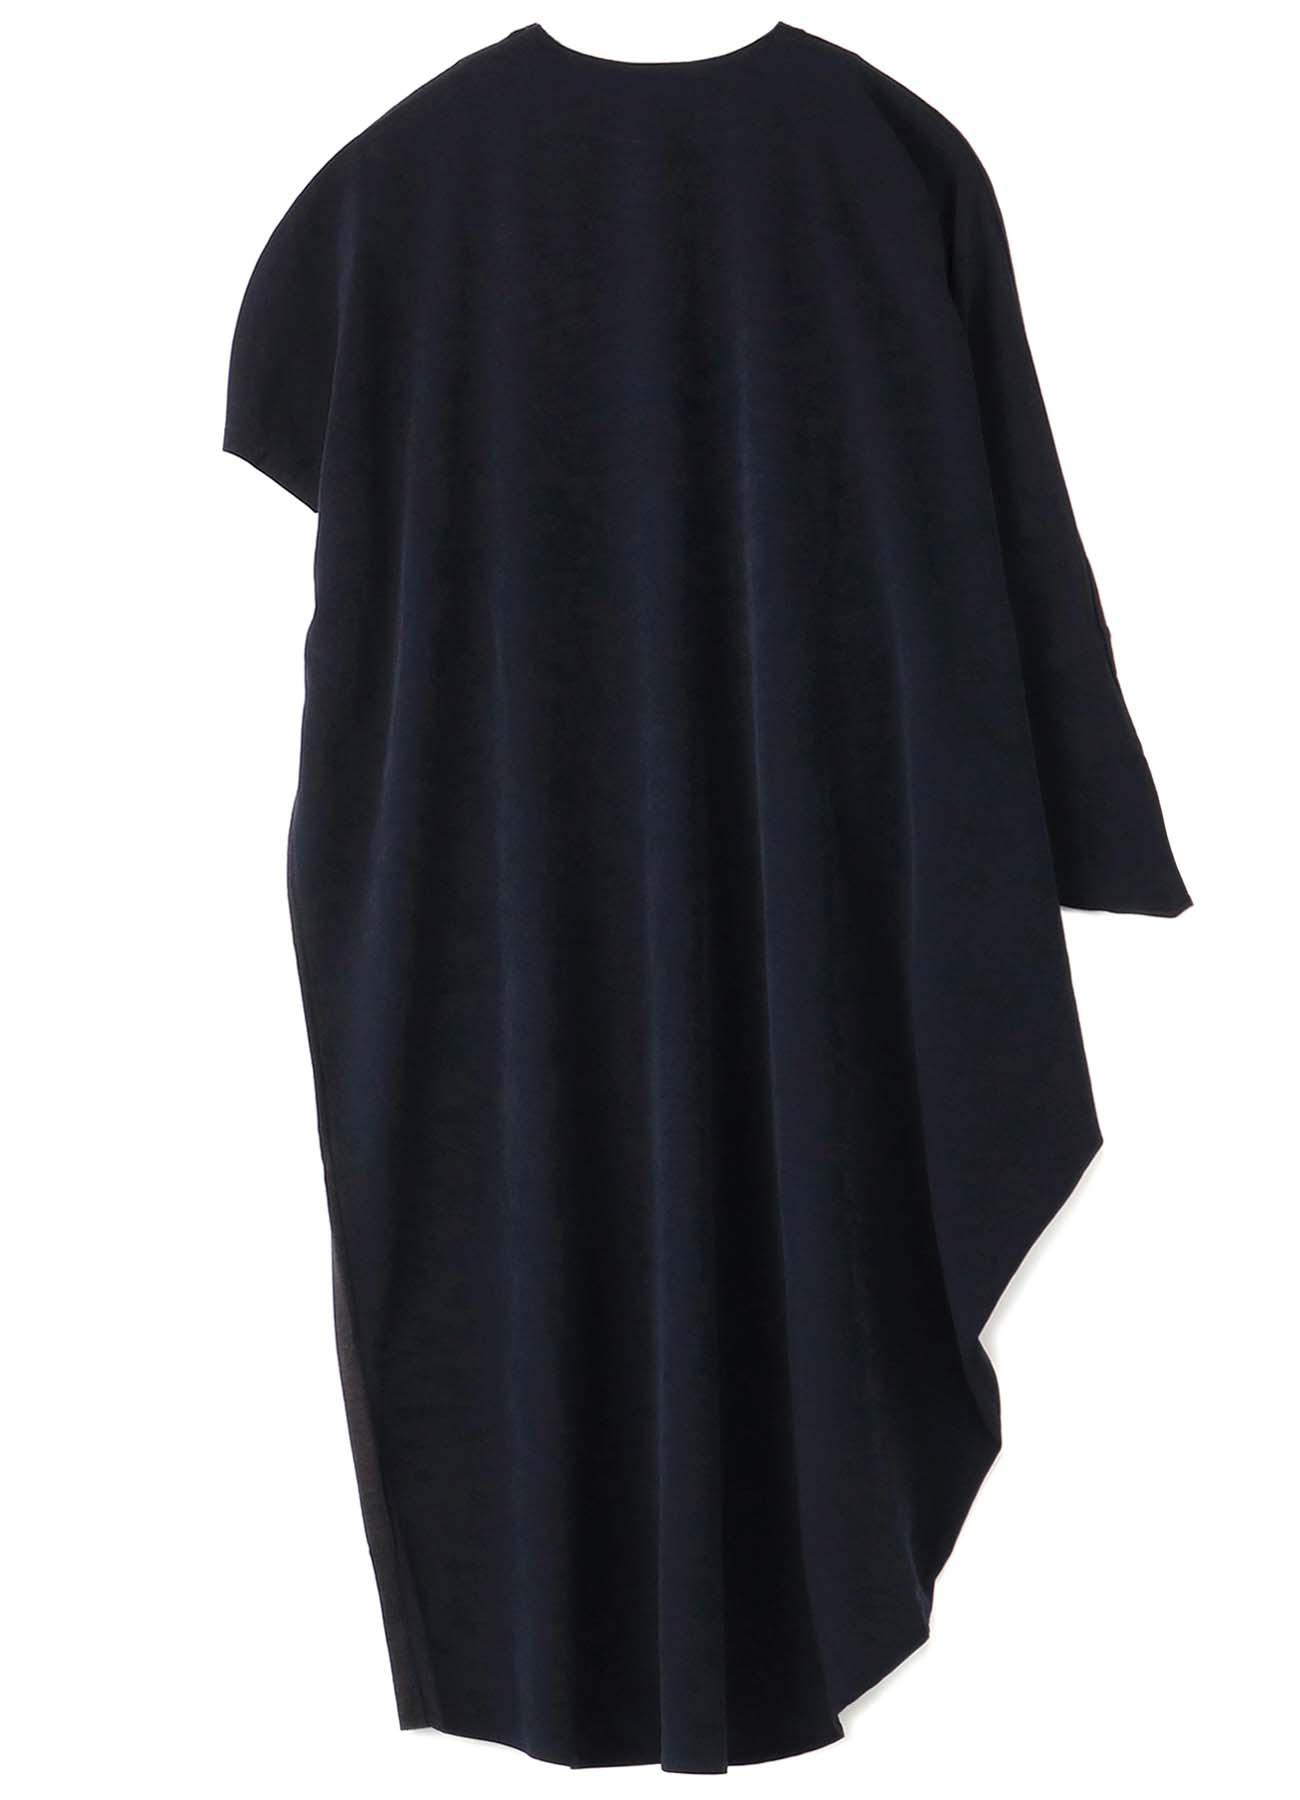 RISMATbyY's DESIGNED SLEEVE ASYMMETRICAL DRESS